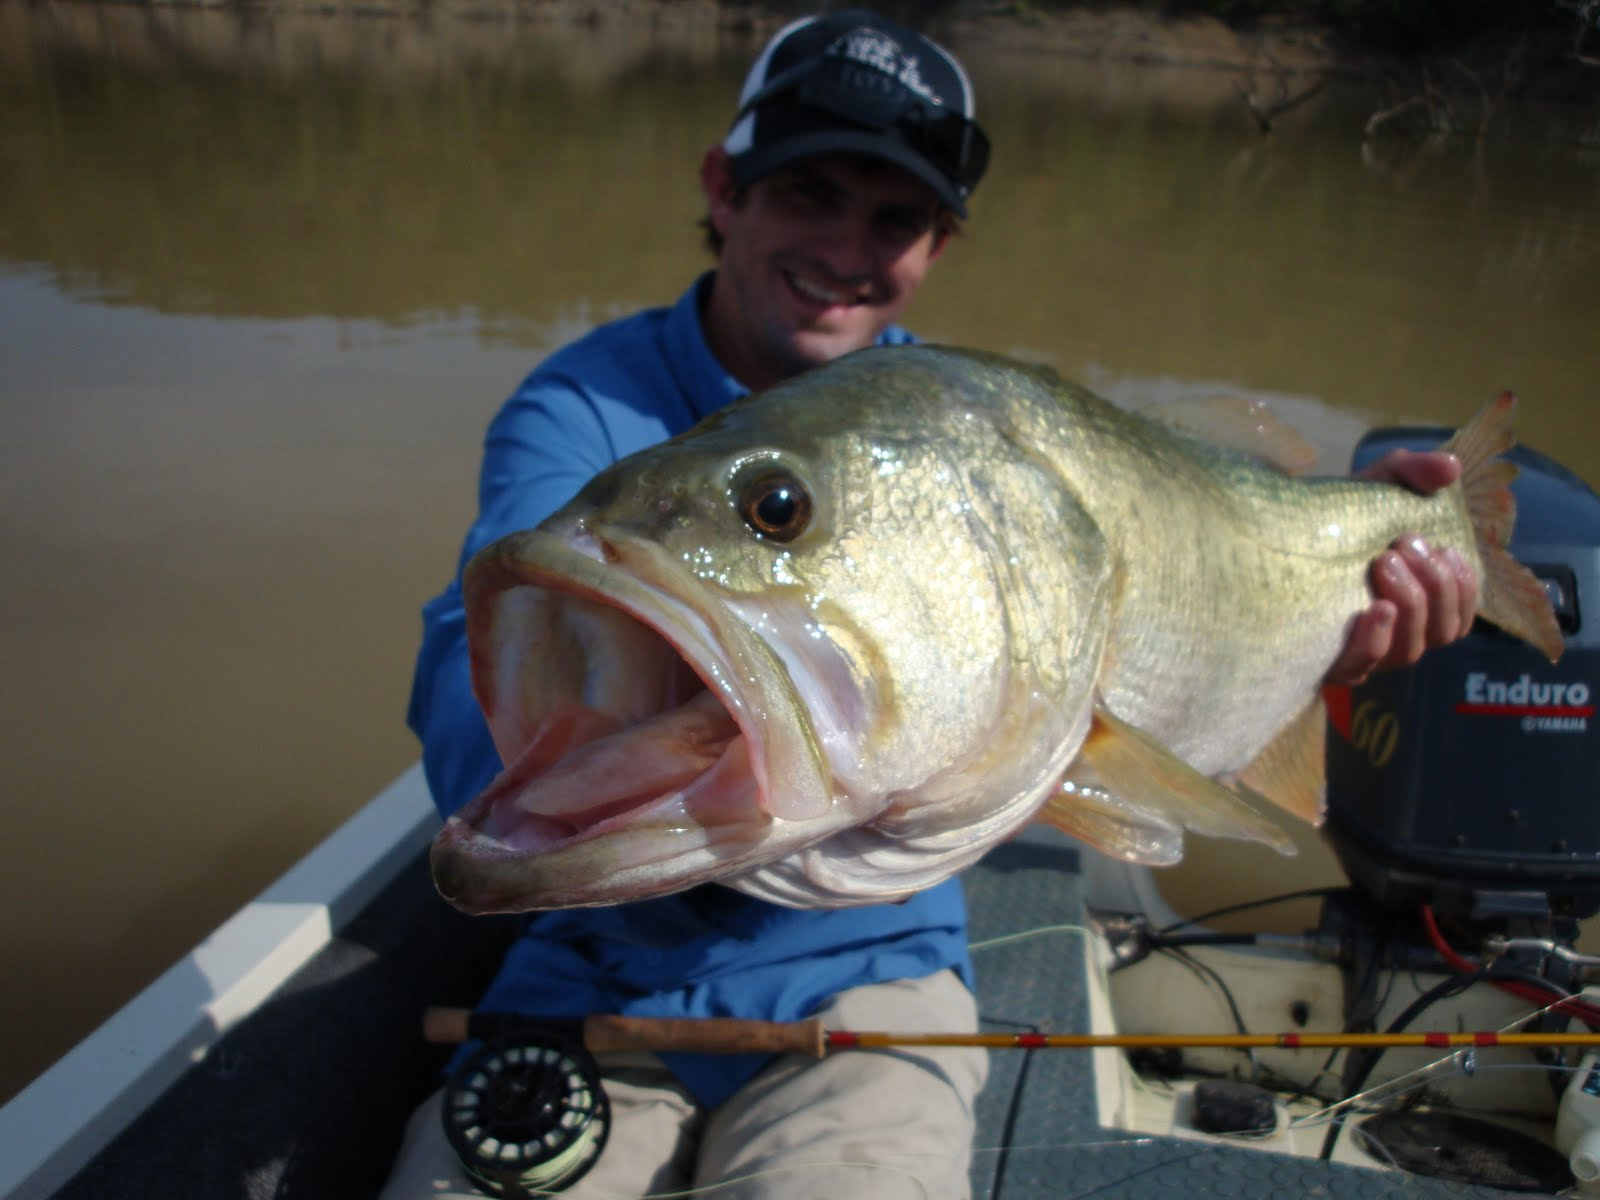 Burl fish youv gatta big mouth for Big mouth fish